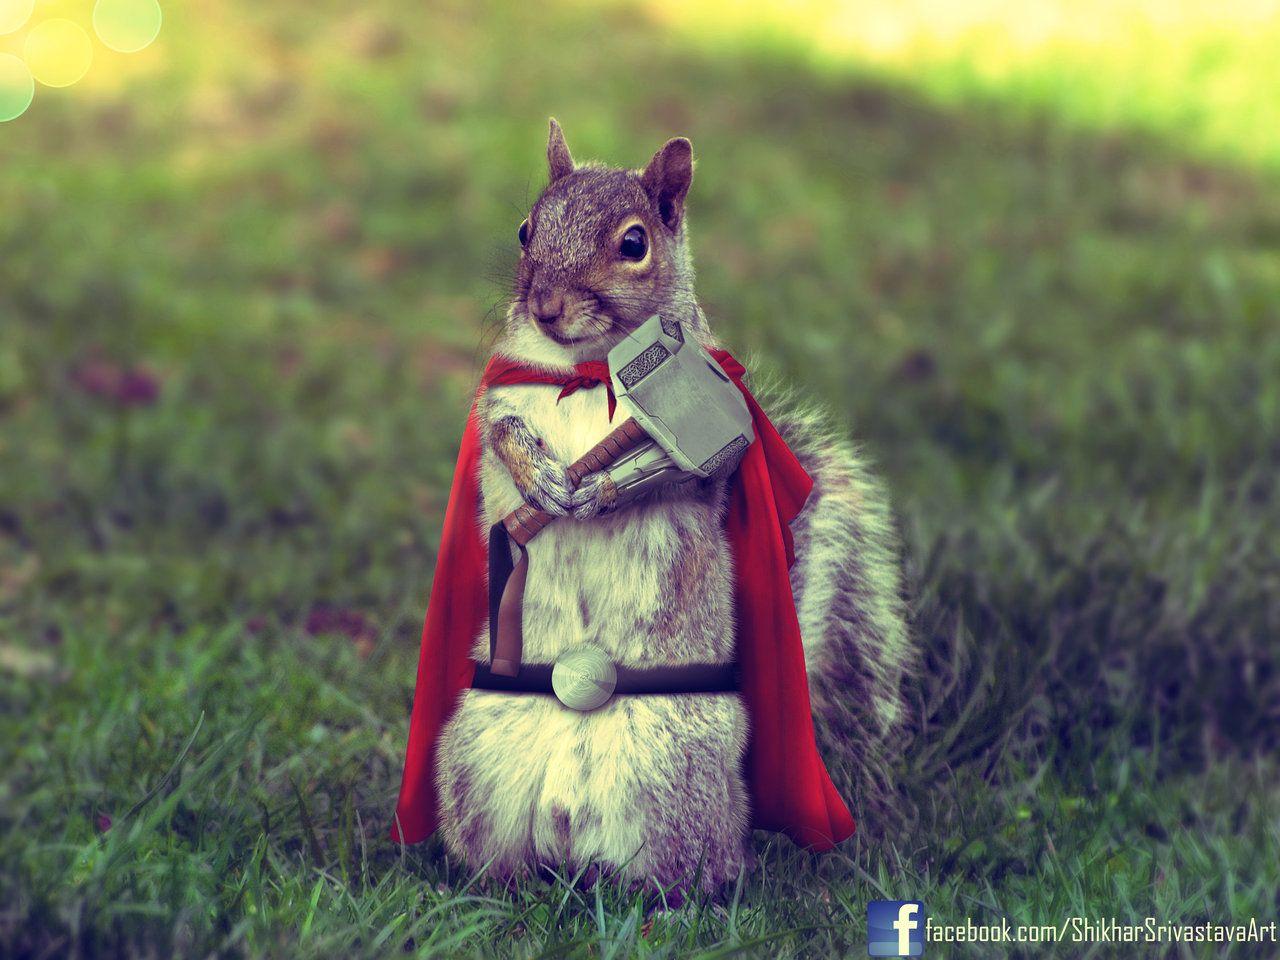 Thor Squirrel By Shikharsrivastavaiantart, But I